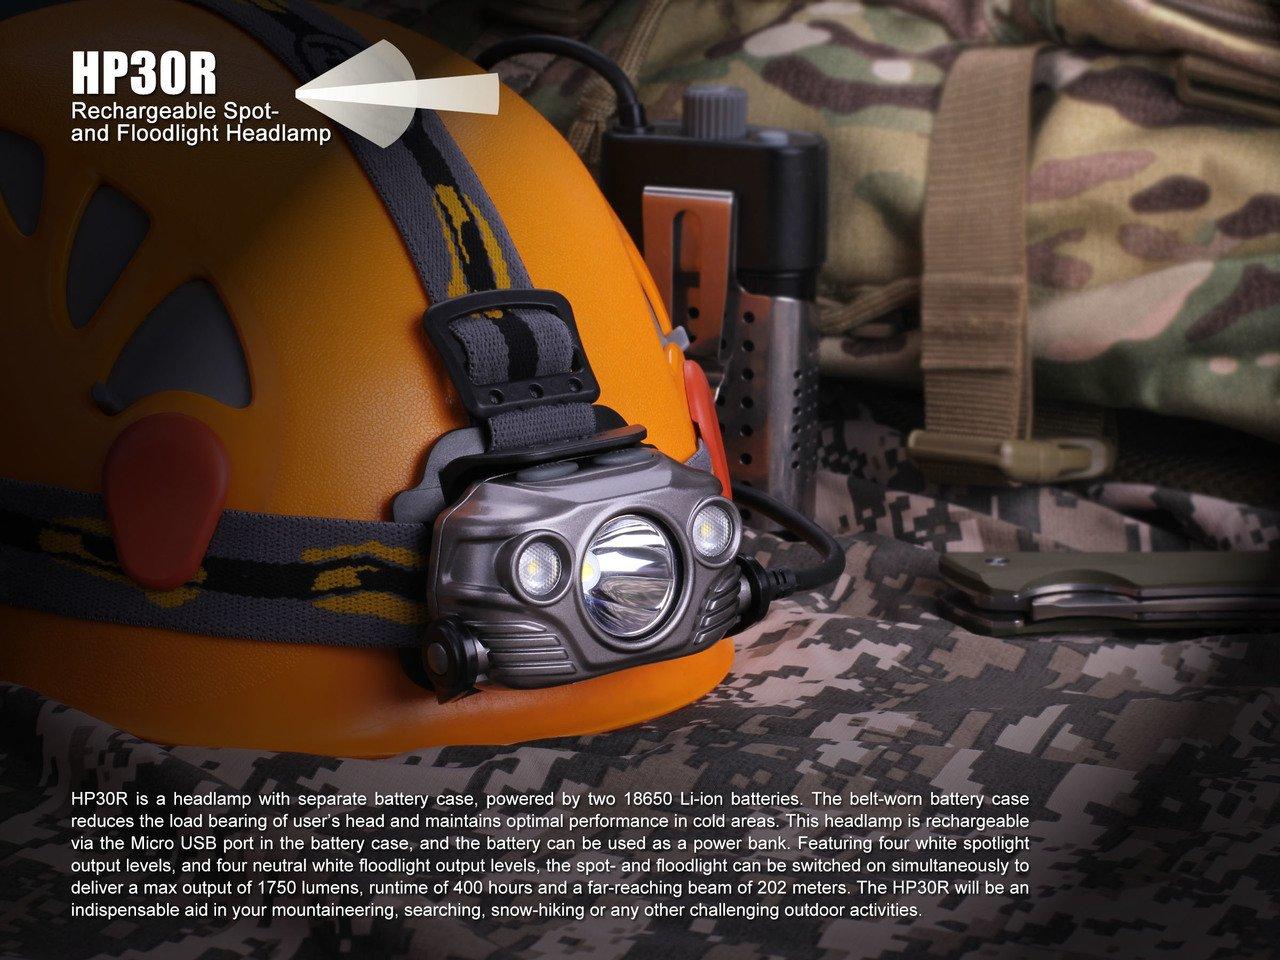 Fenix HP30R 1750 Lumen CREE LED Headlamp (Iron Grey) with 2 X Fenix 18650 Li-ion rechargeable batteries and Four EdisonBright CR123A Lithium batteries bundle by Fenix (Image #4)